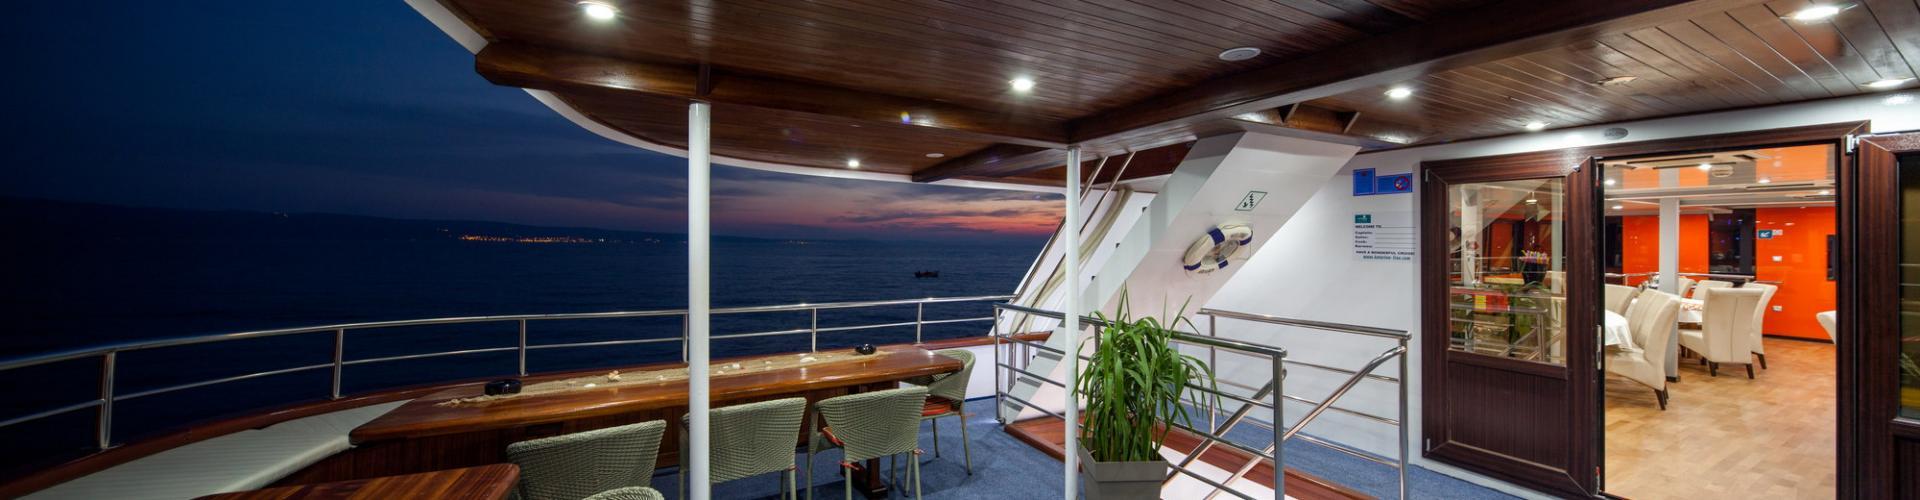 Motoryacht Premium Superior Kreuzfahrtschiff MV Amalia